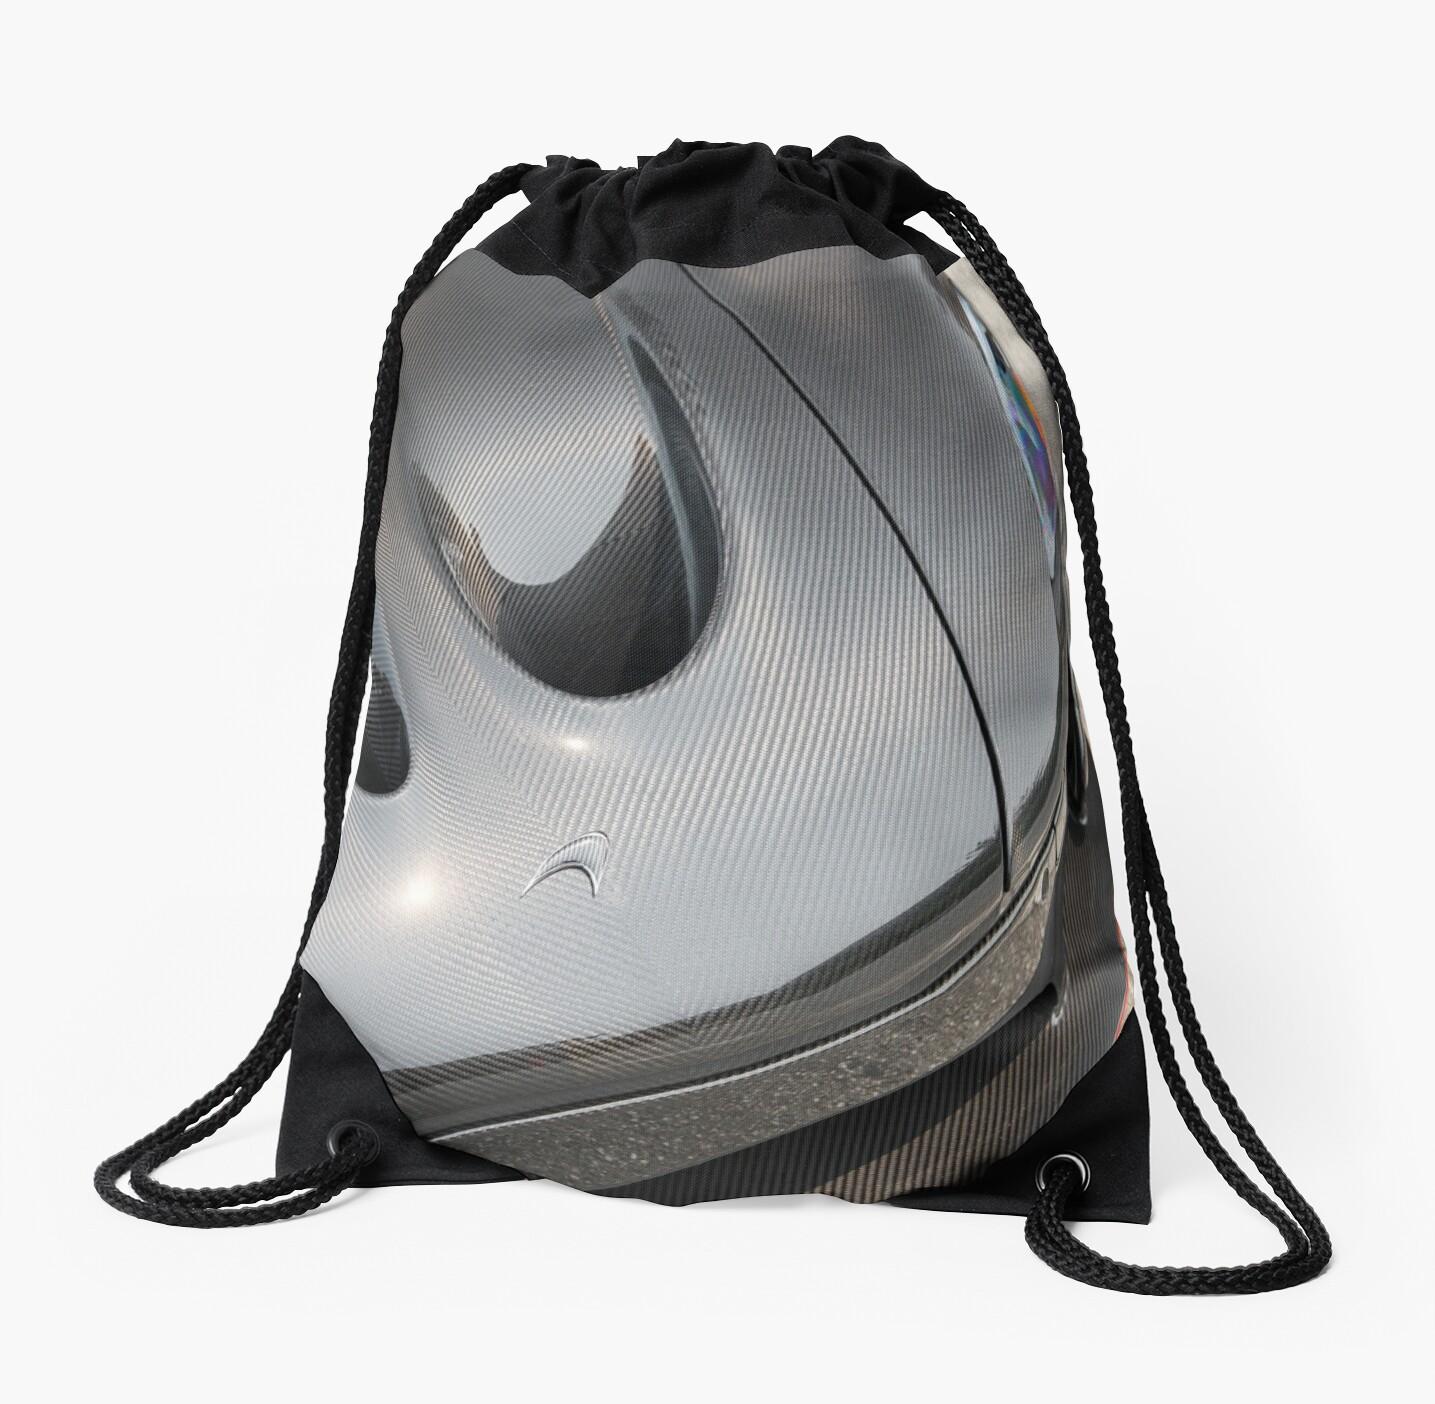 933db365b5 Carbon Fiber McLaren P1